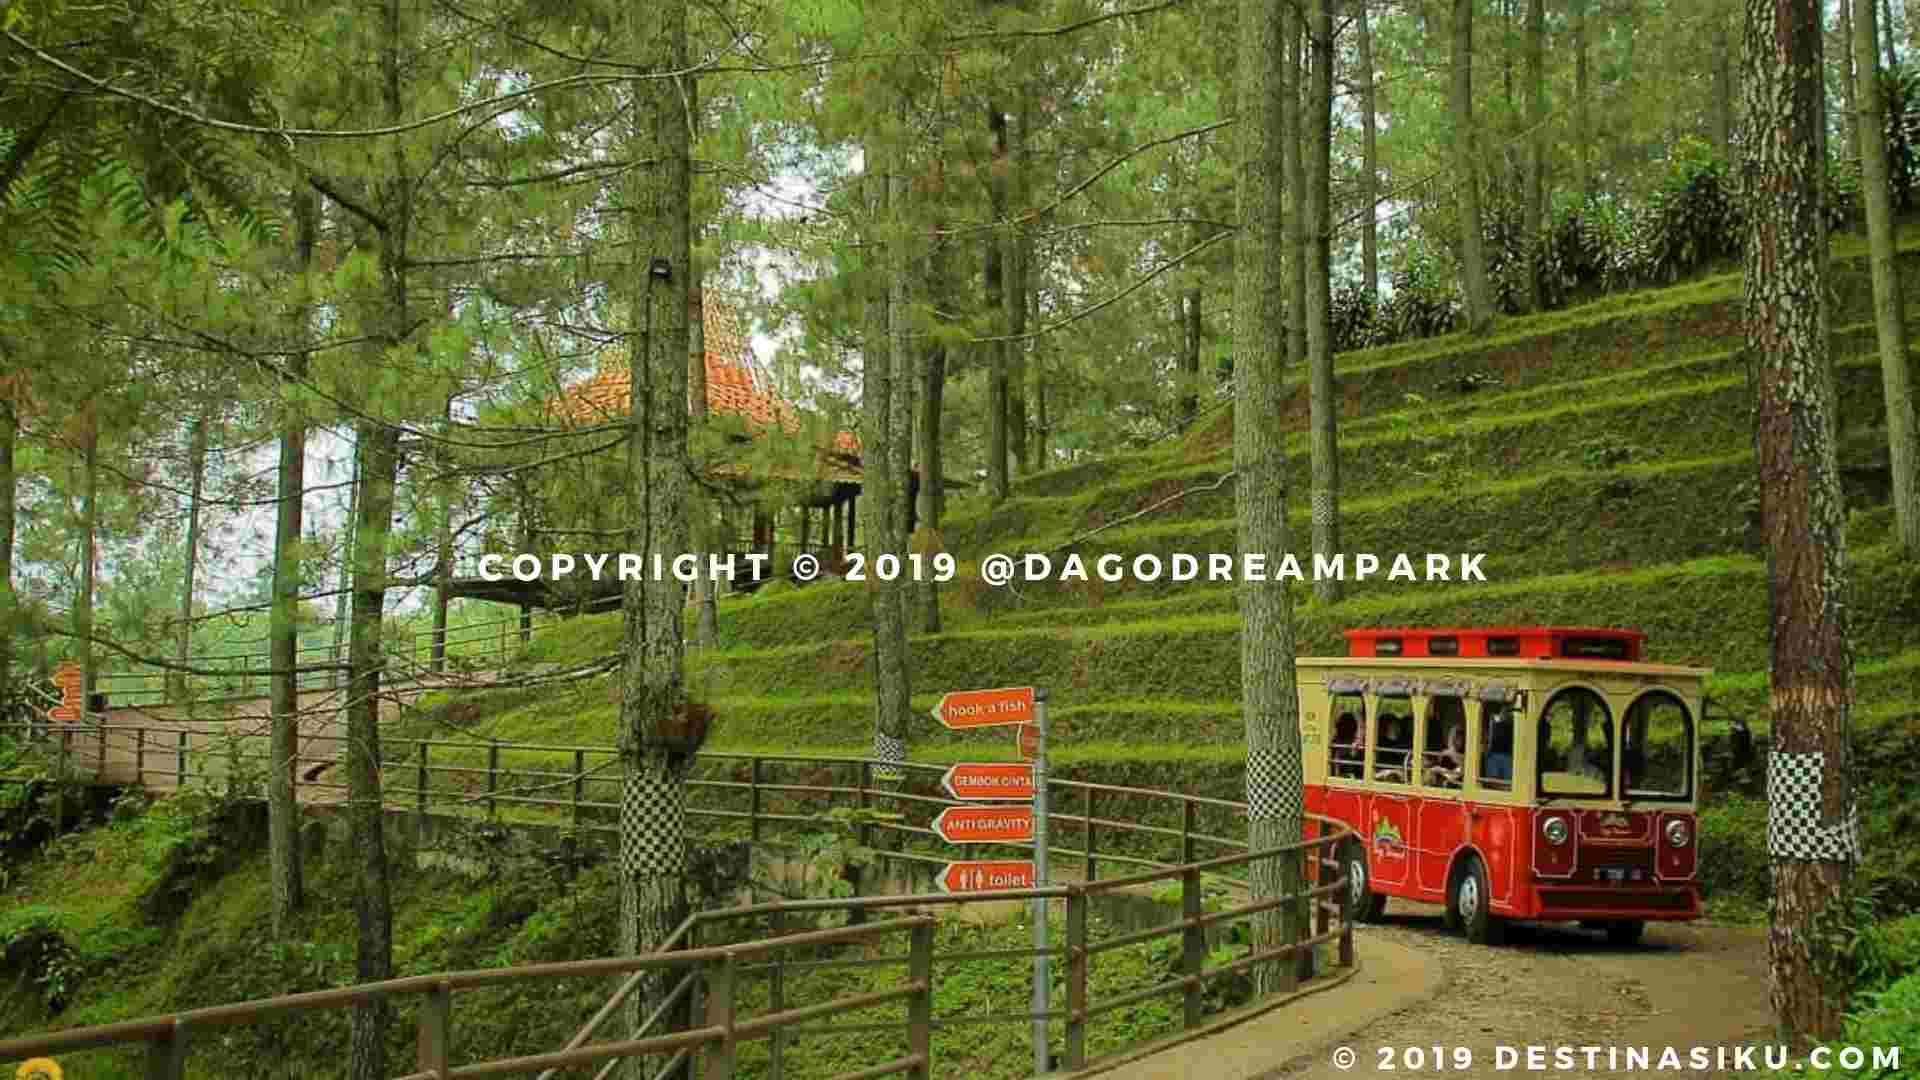 dago dream park bandung tripadvisor